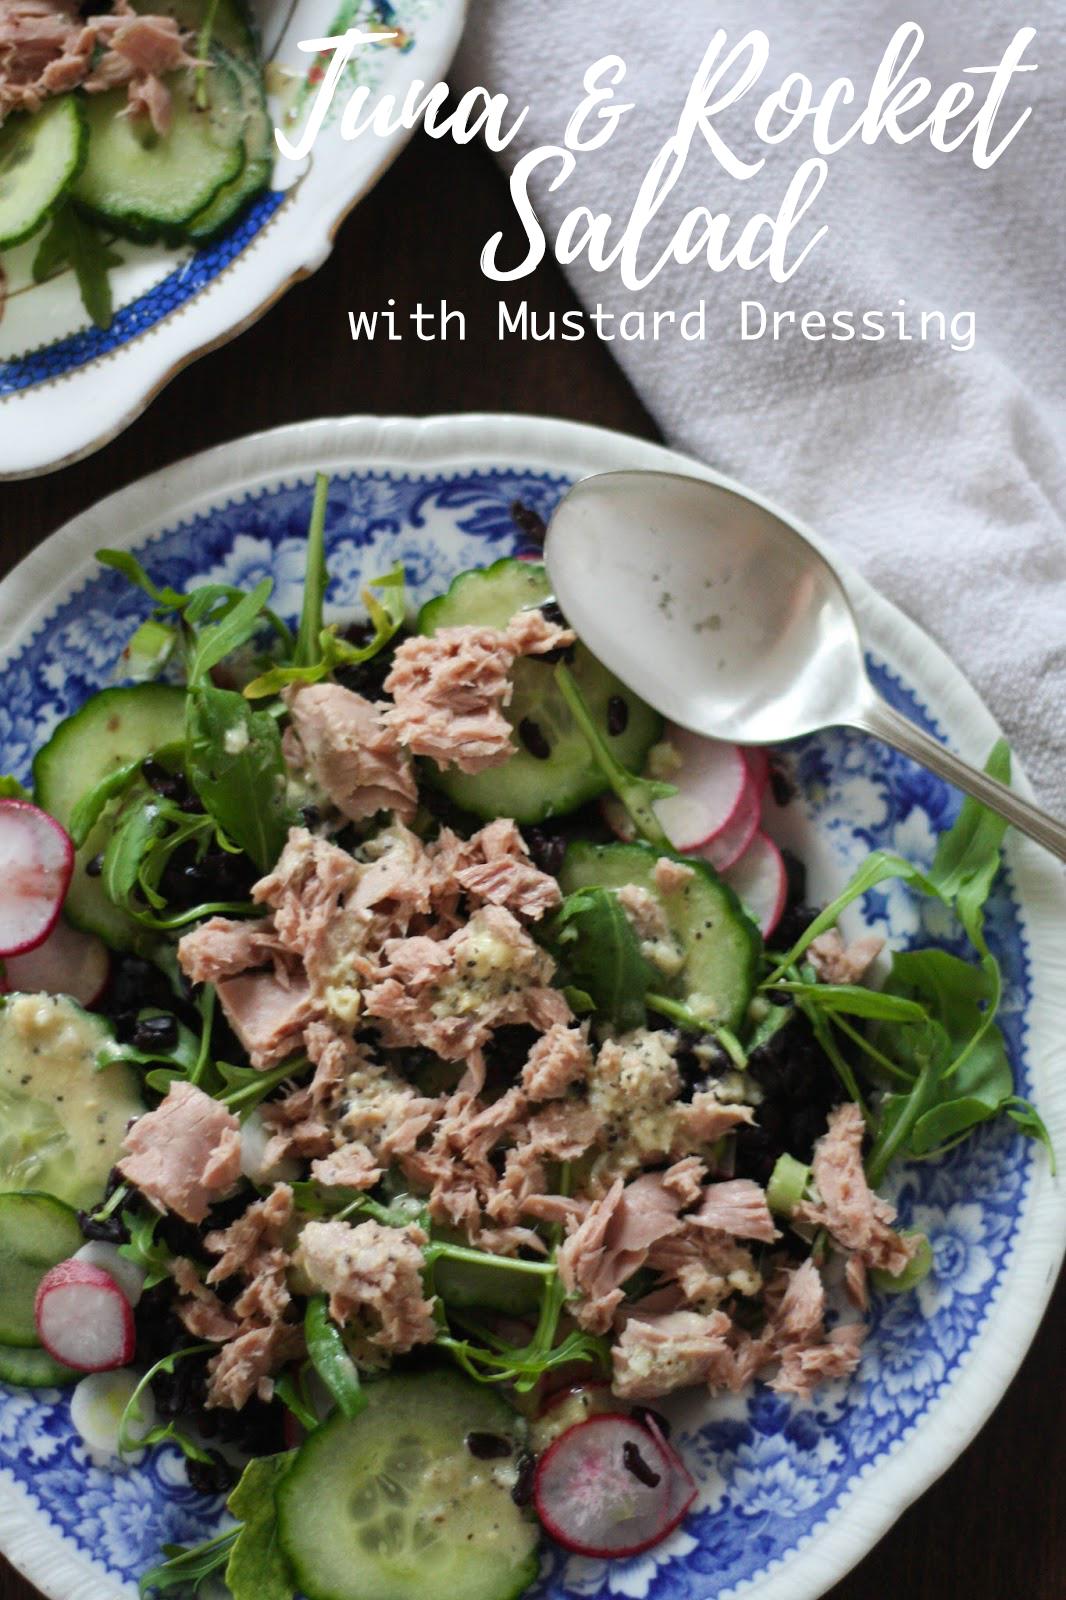 Tuna & rocket salad with mustard dressing